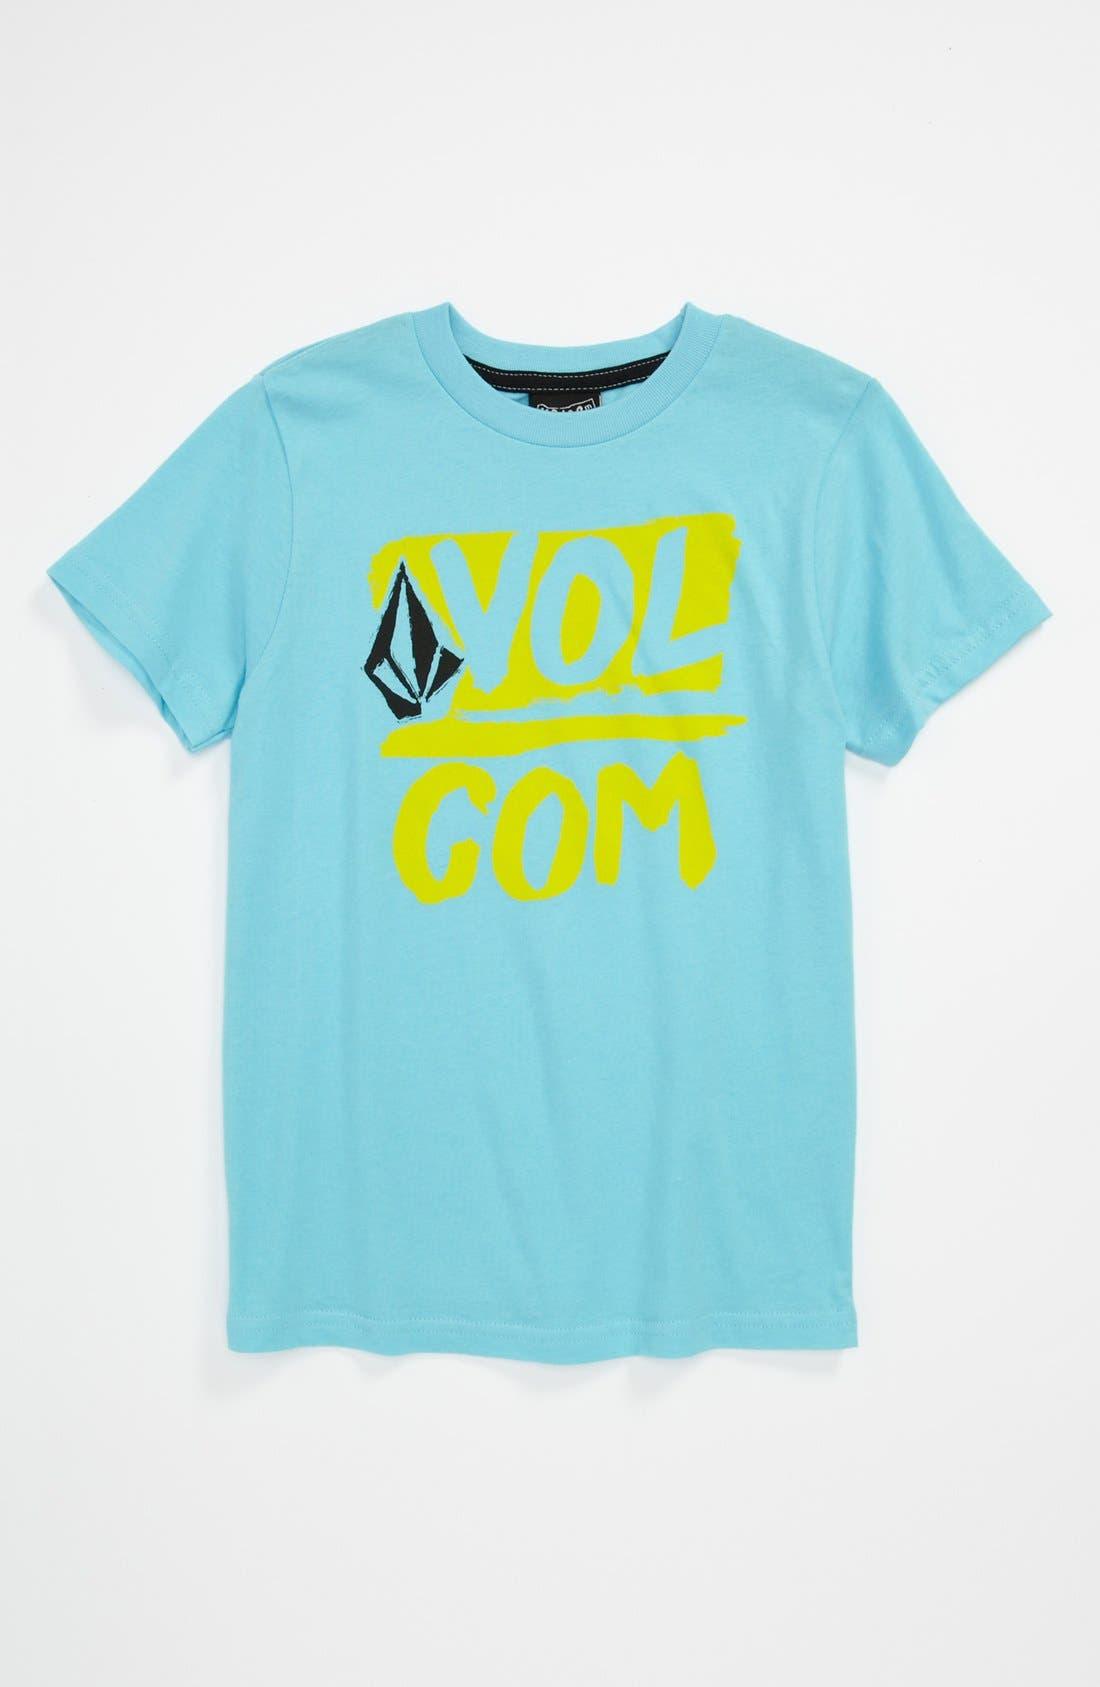 Alternate Image 1 Selected - Volcom 'Linked Up' T-Shirt (Little Boys)